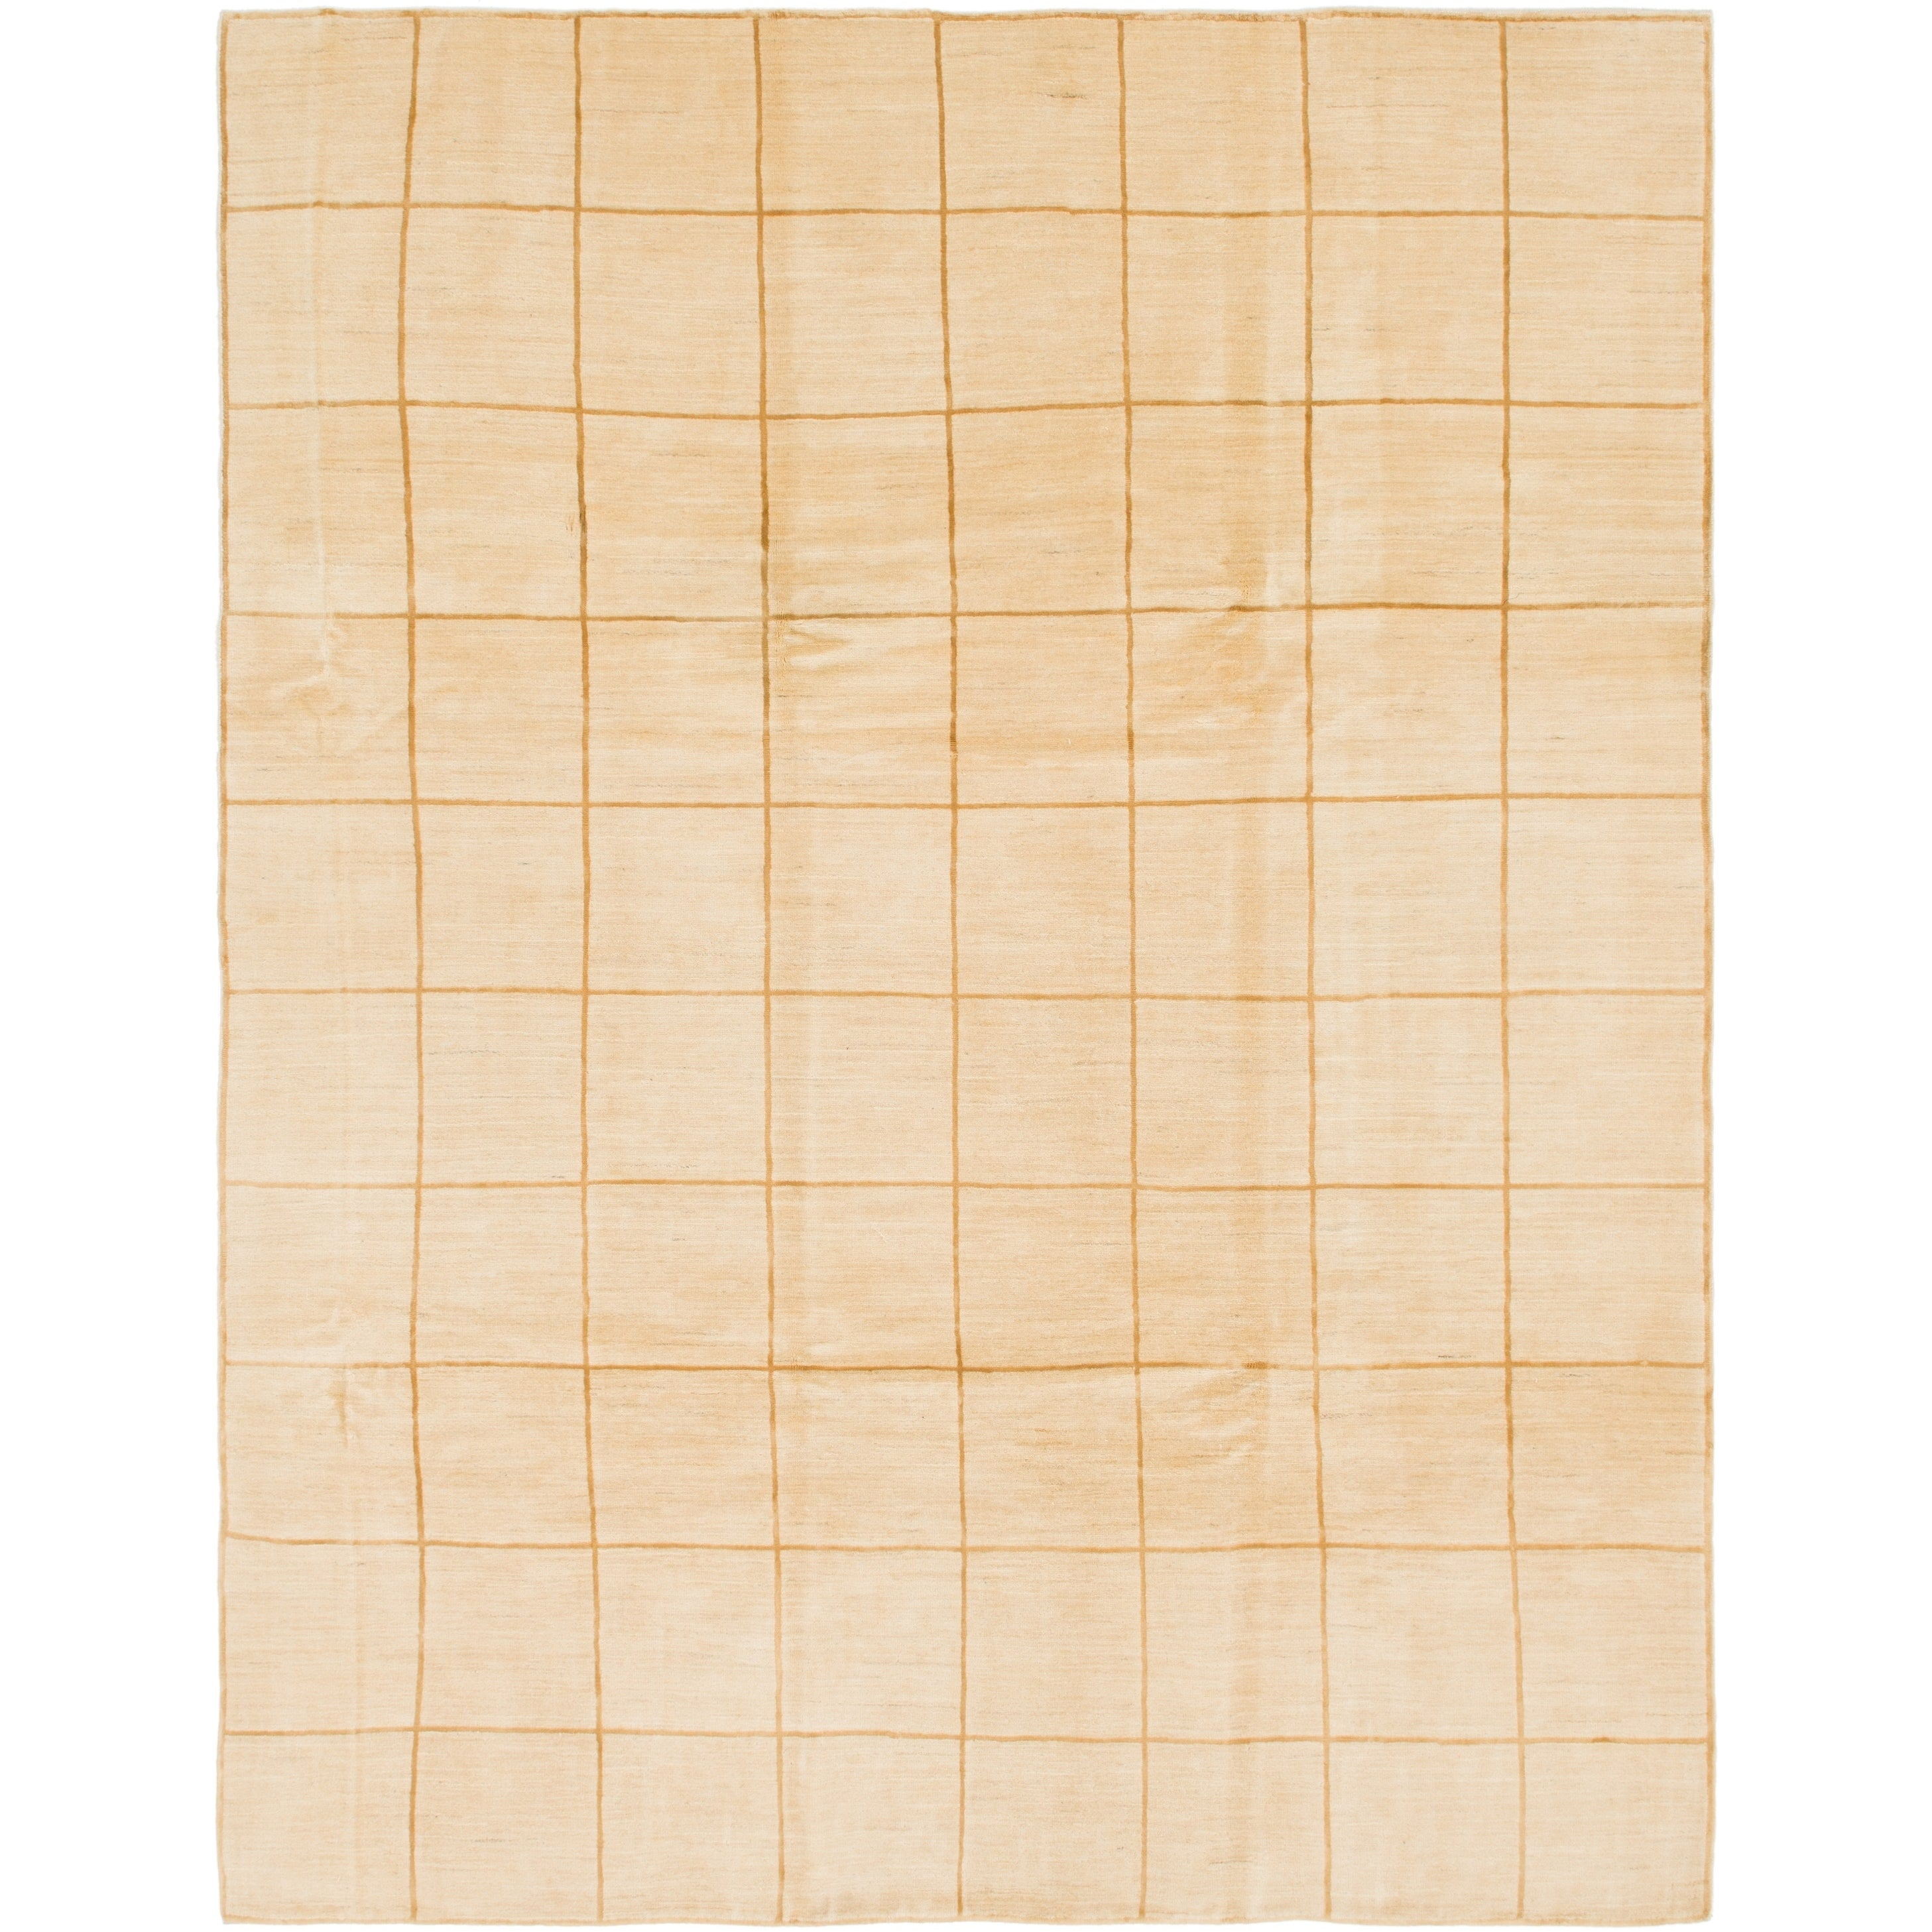 Hand Knotted Kashkuli Gabbeh Wool Area Rug - 8 6 x 11 (Cream - 8 6 x 11)